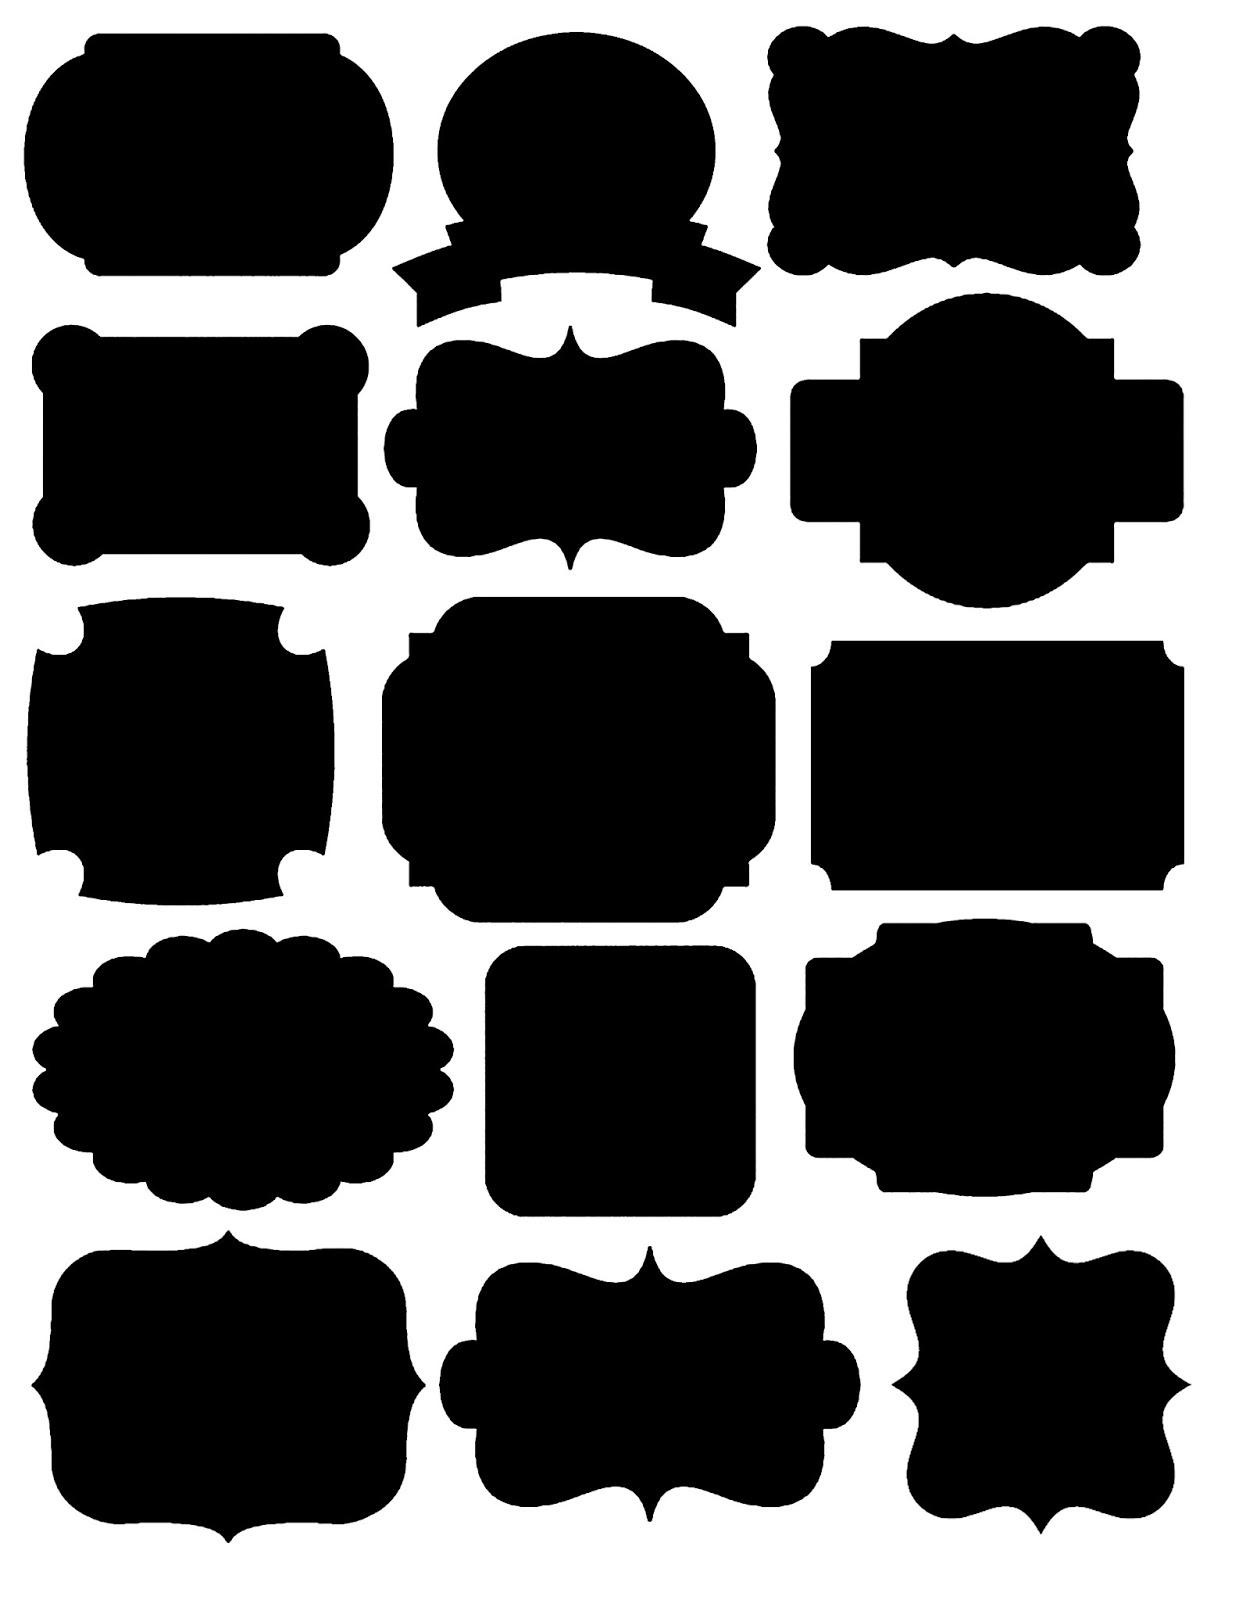 Doodlecraft: Freebies! Printables Labels And Chalkboard Fonts